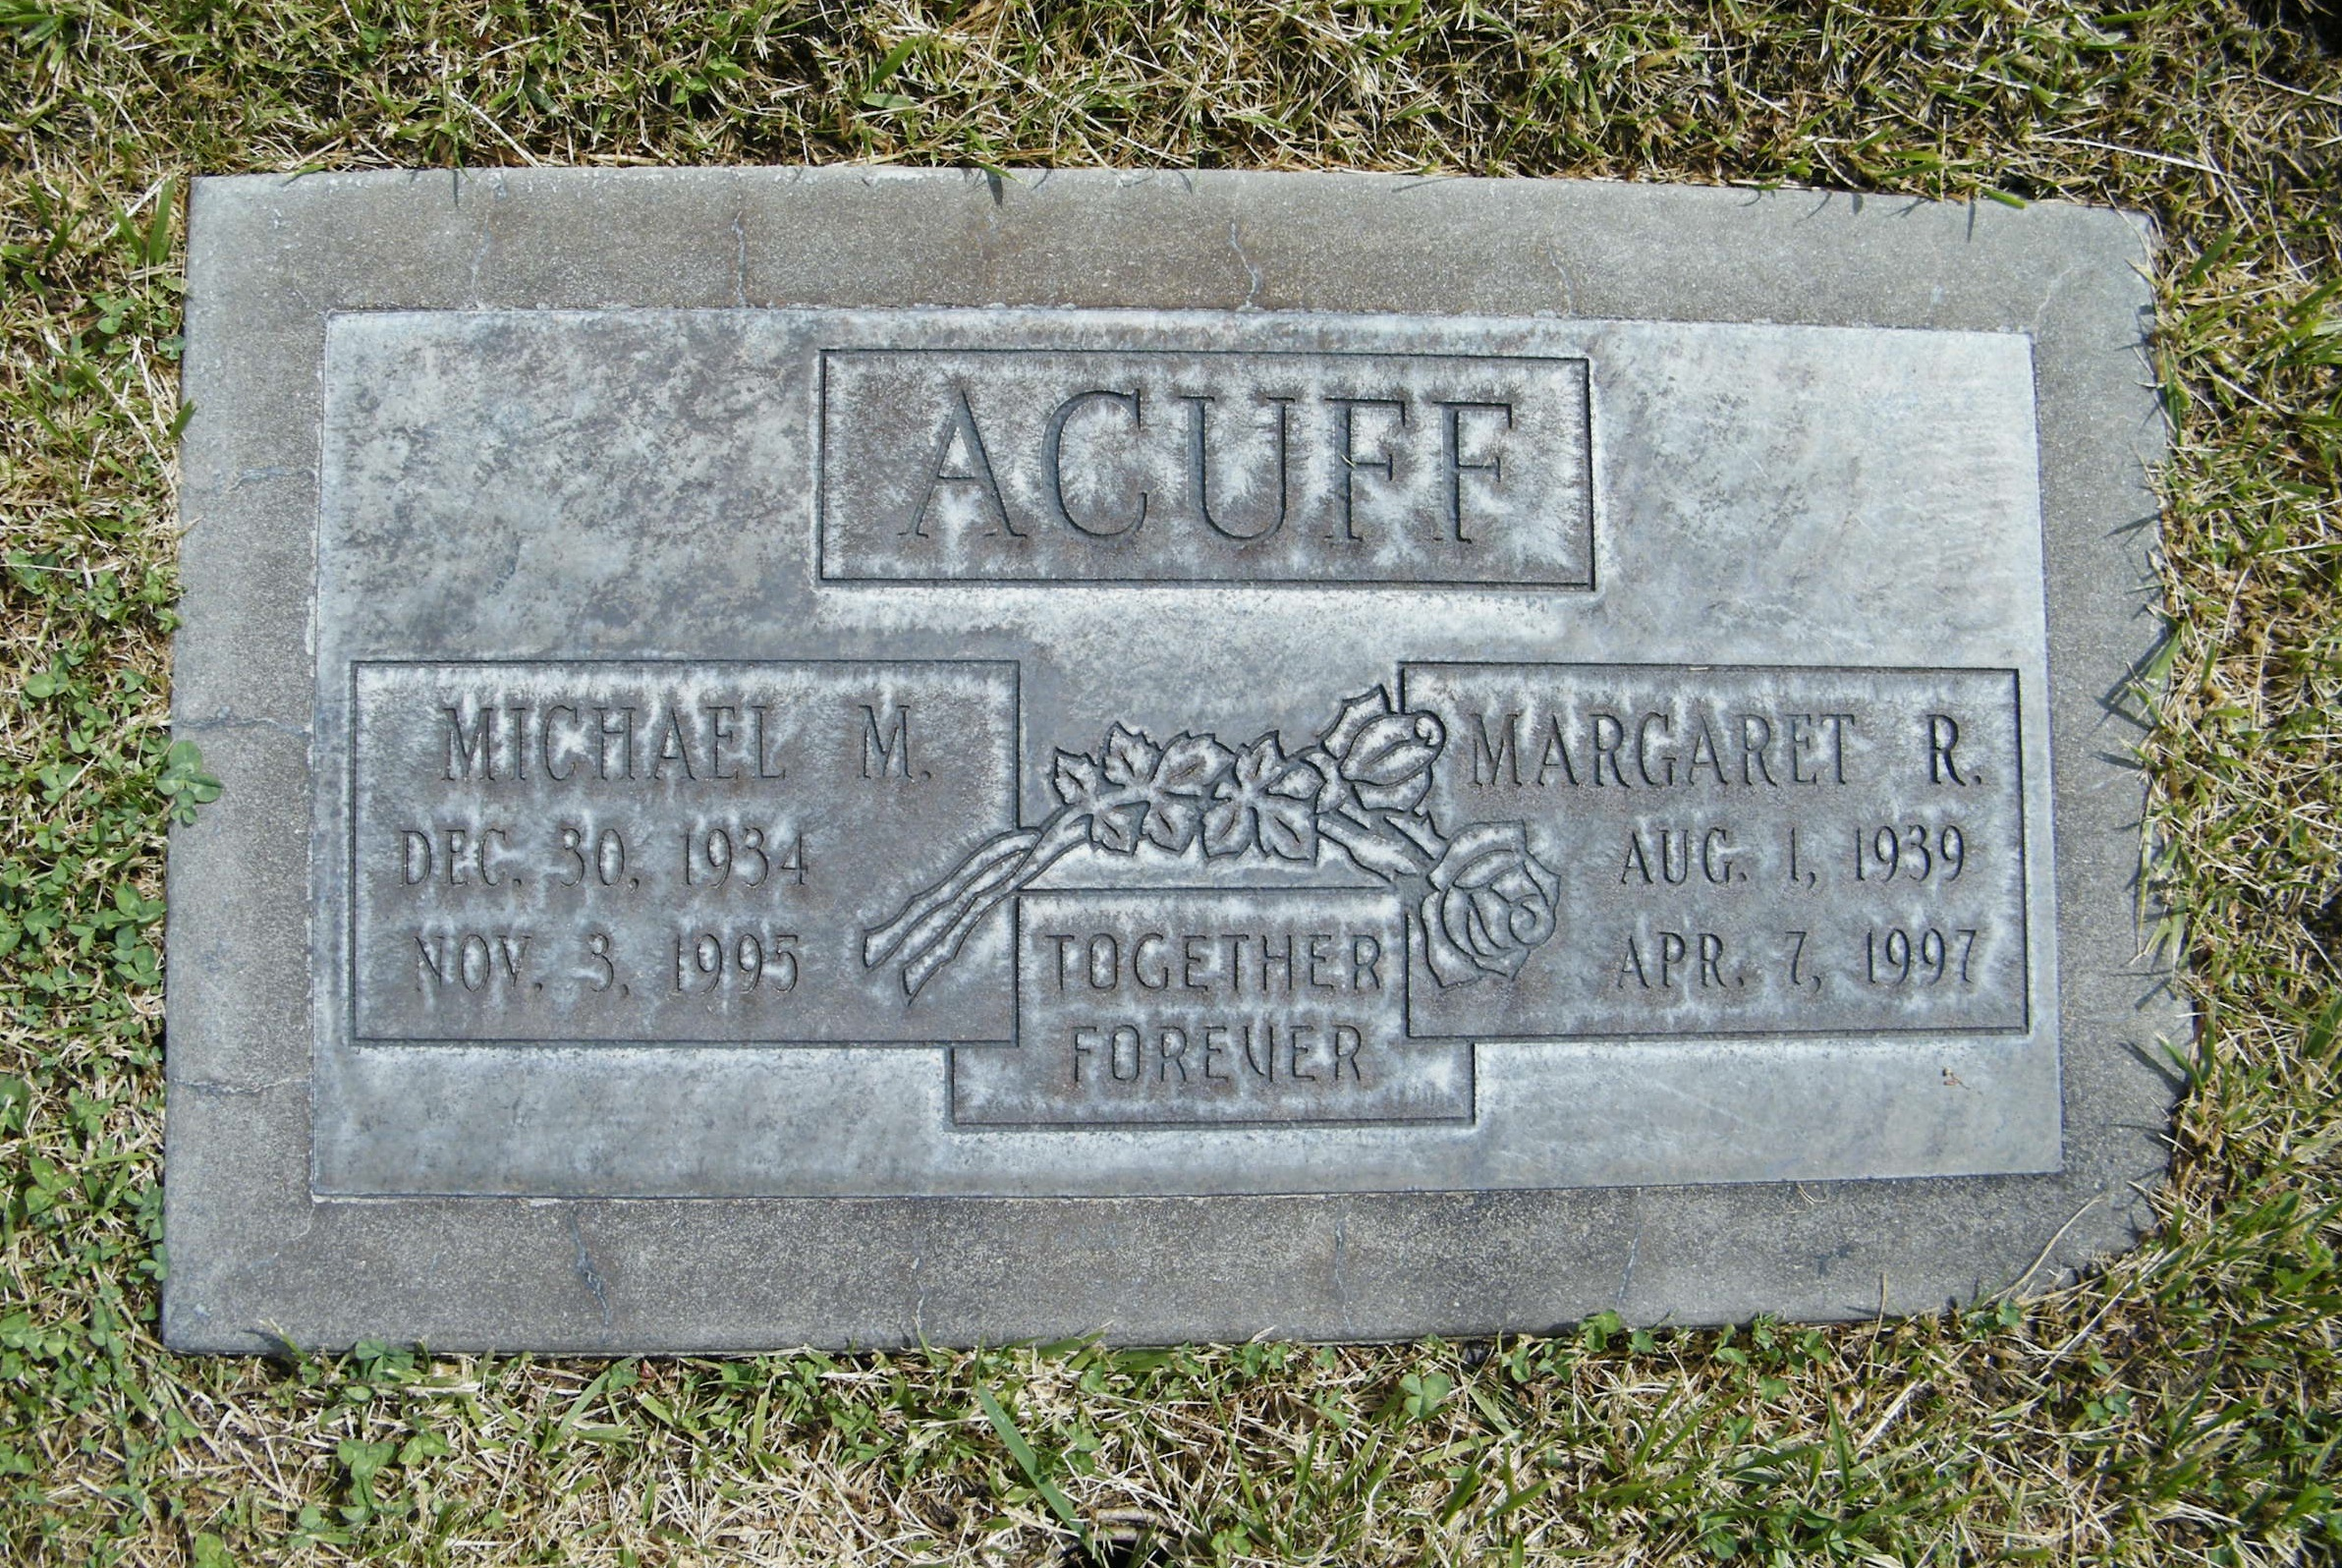 Michael McMahan Acuff